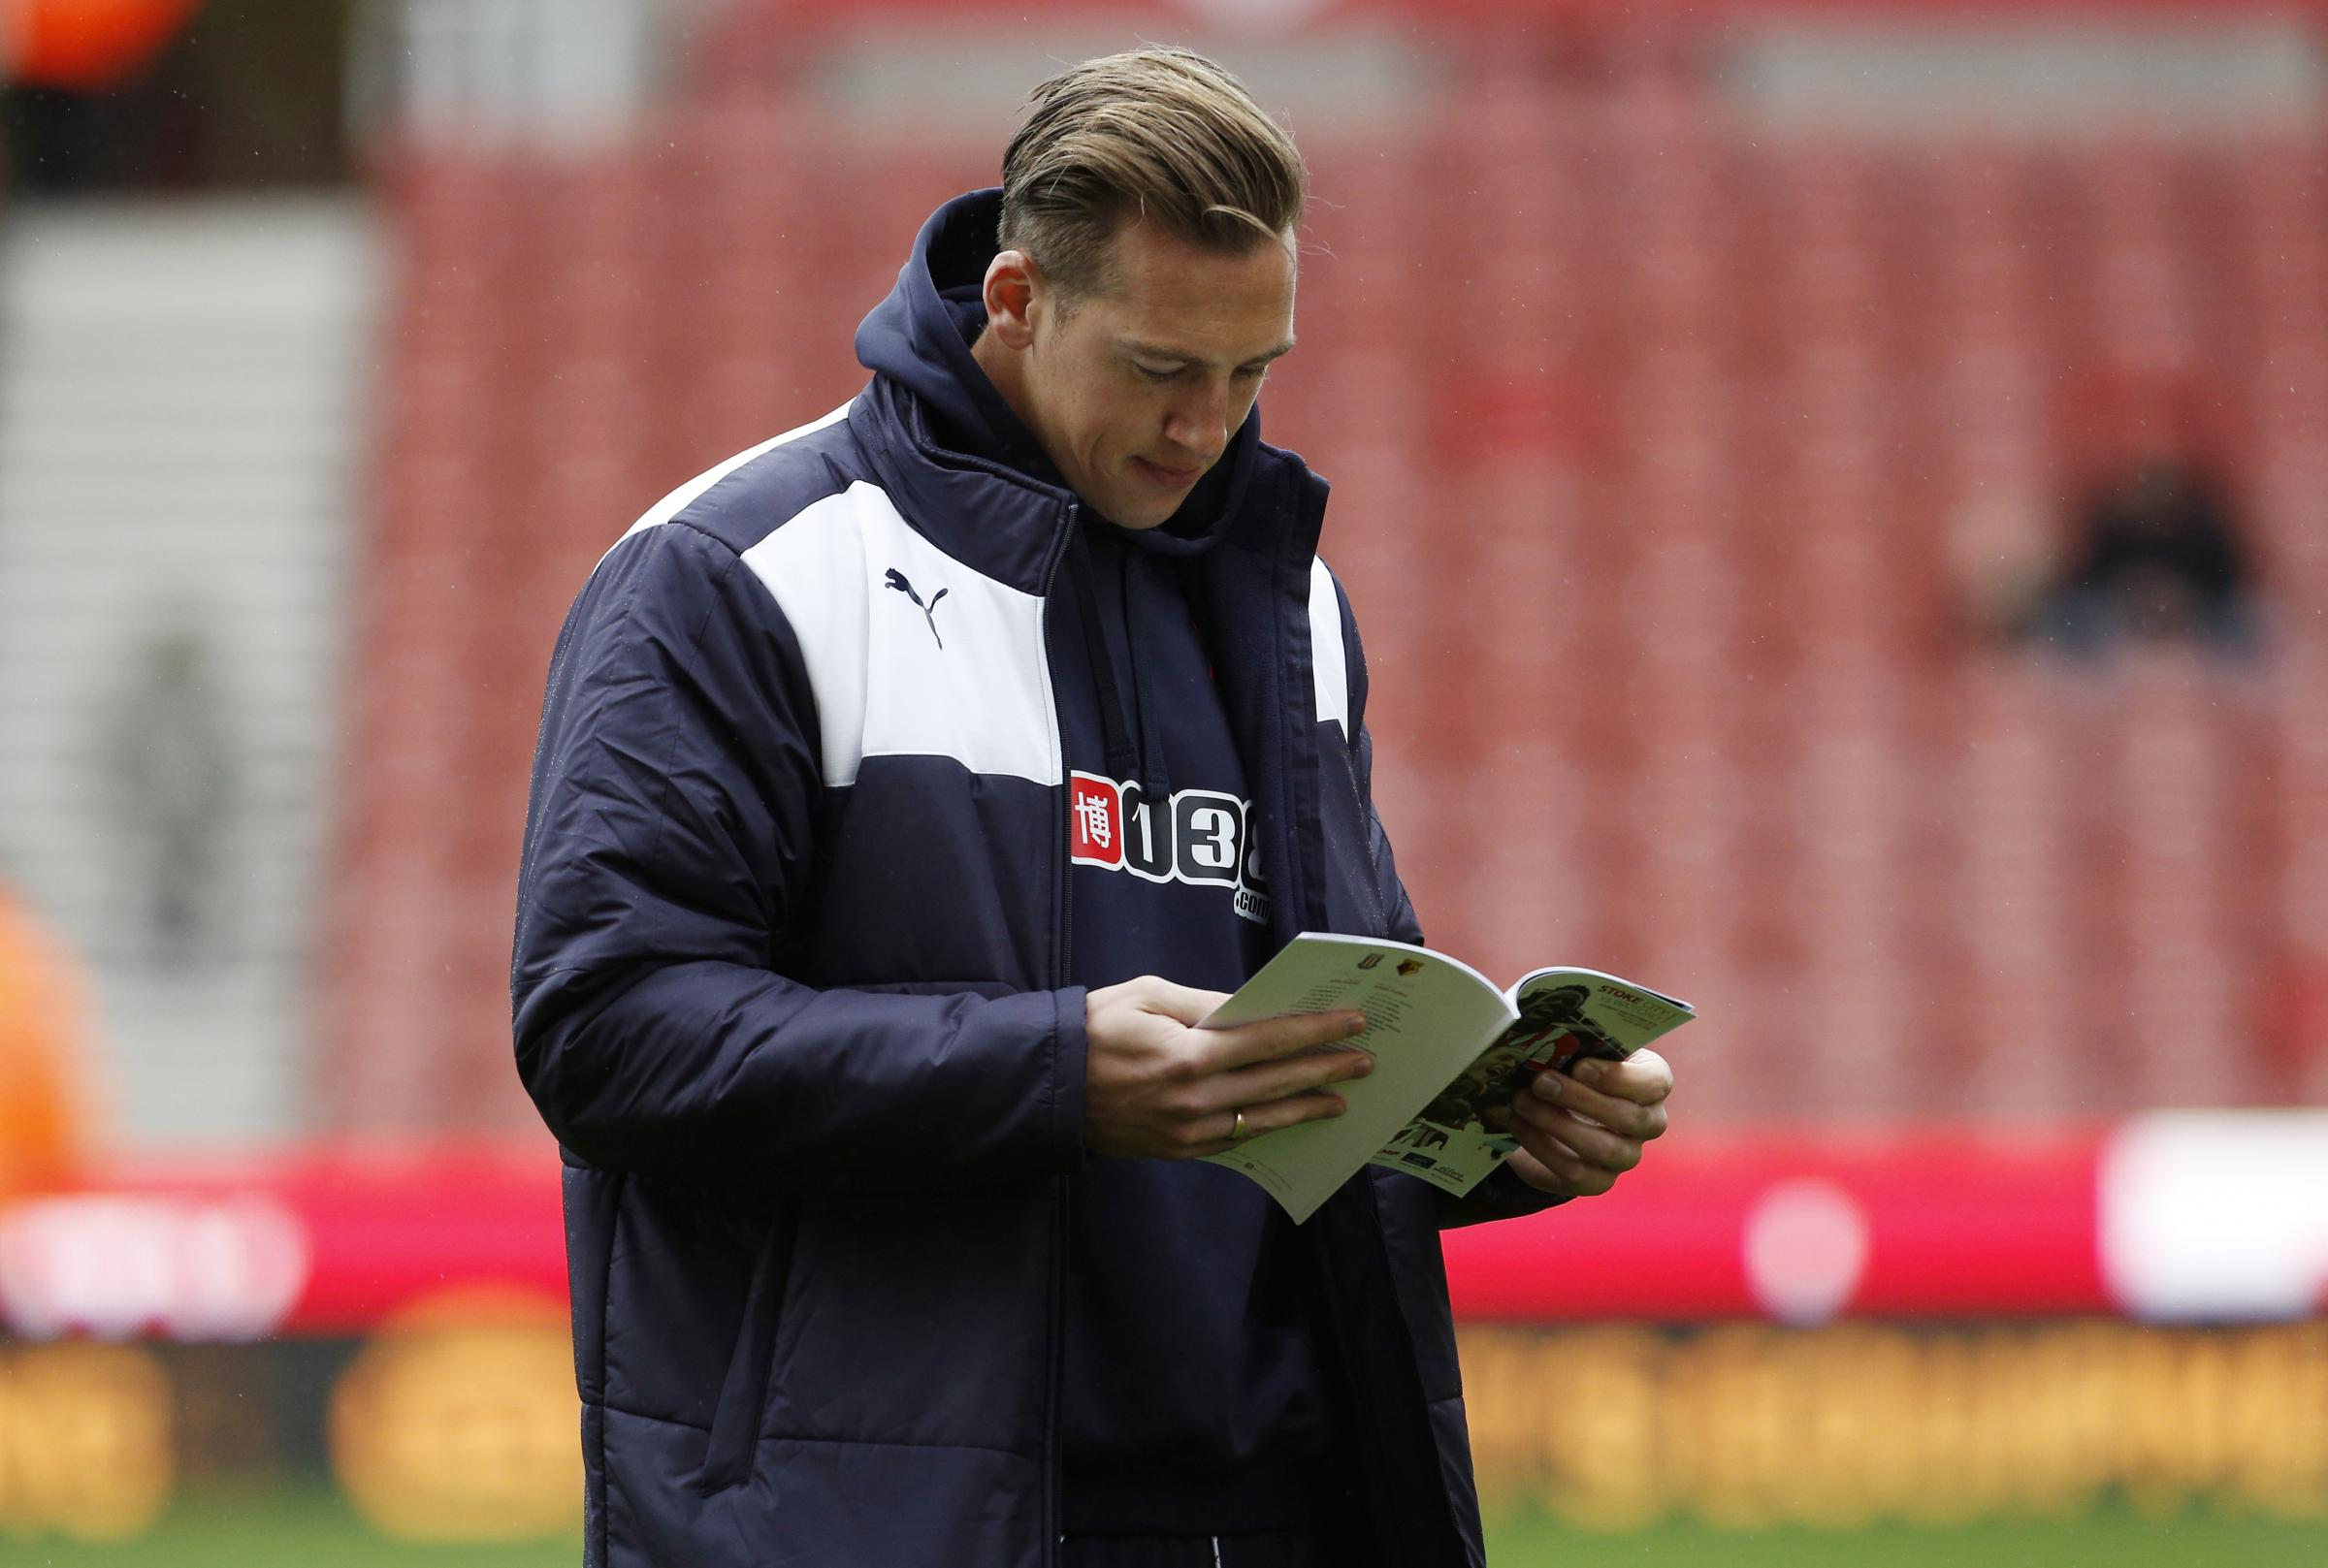 Former Watford goalkeeper Rene Gilmartin named Republic of Ireland Under 21 goalkeeping coach